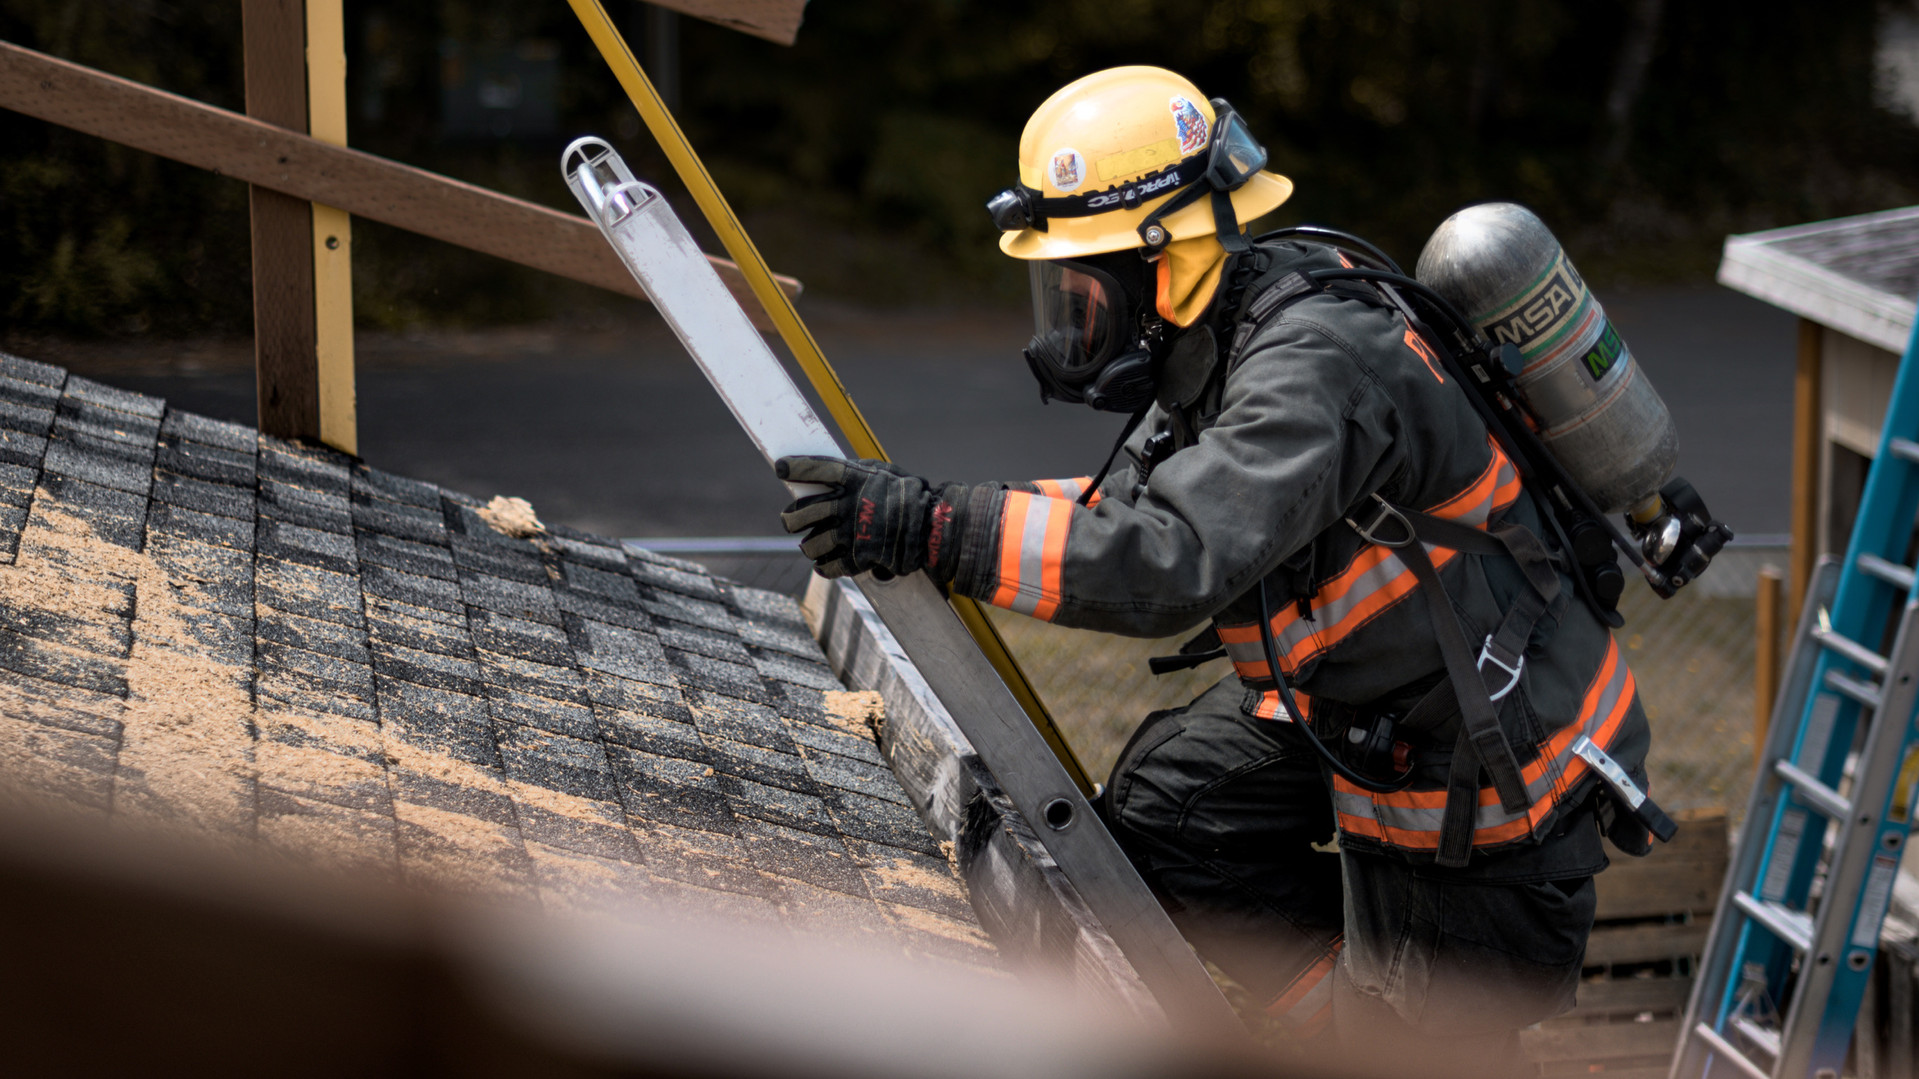 Firefighter Training- vent